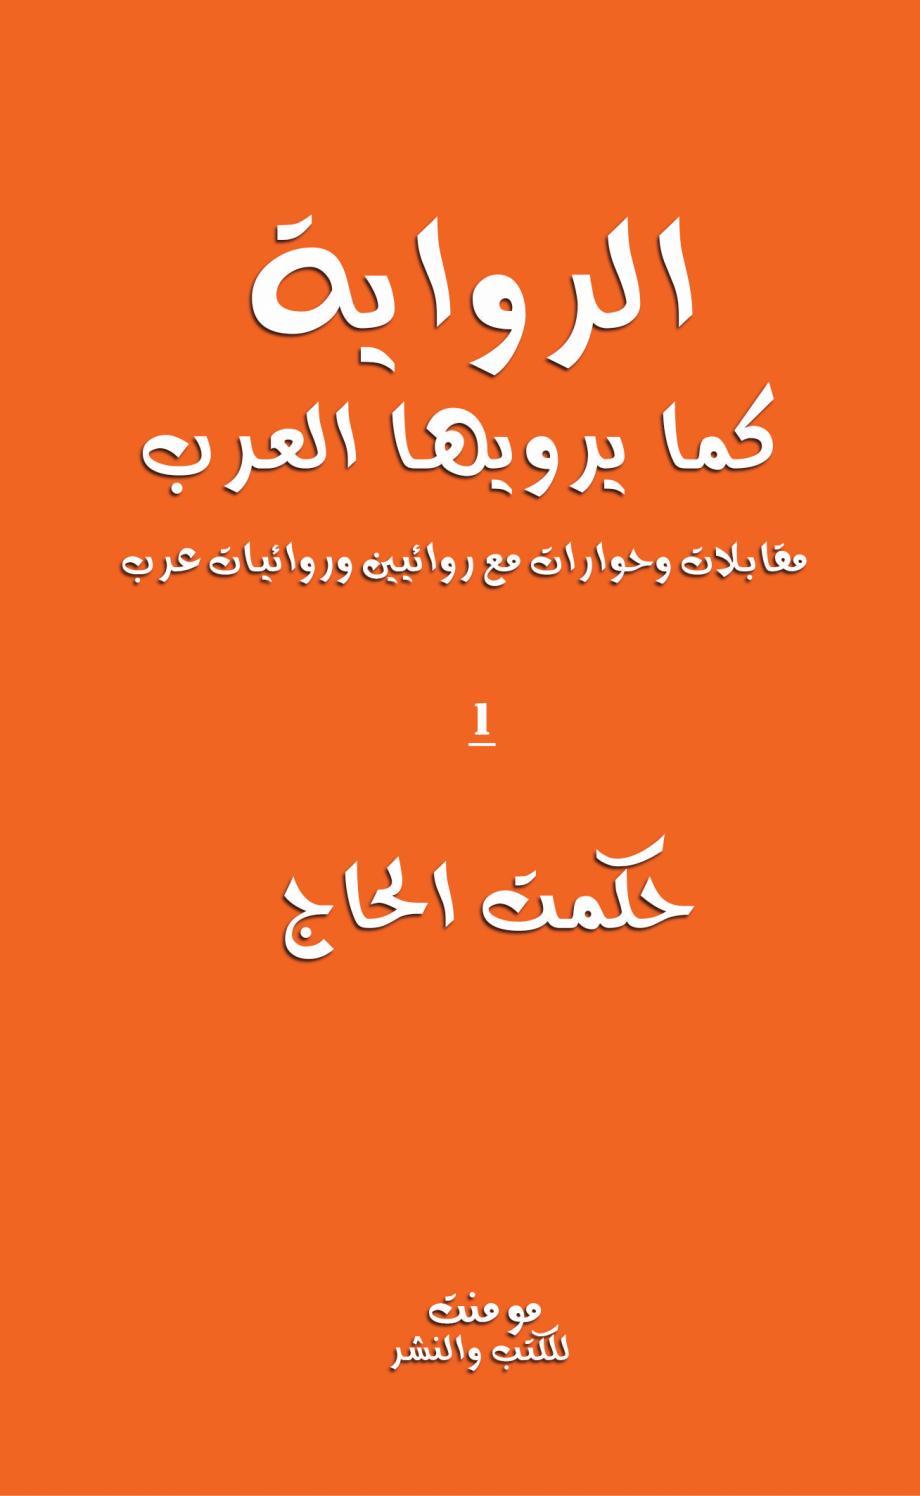 4f48fa2c5 الرواية كما يرويها العرب by مومنت للكتب والنشر - issuu